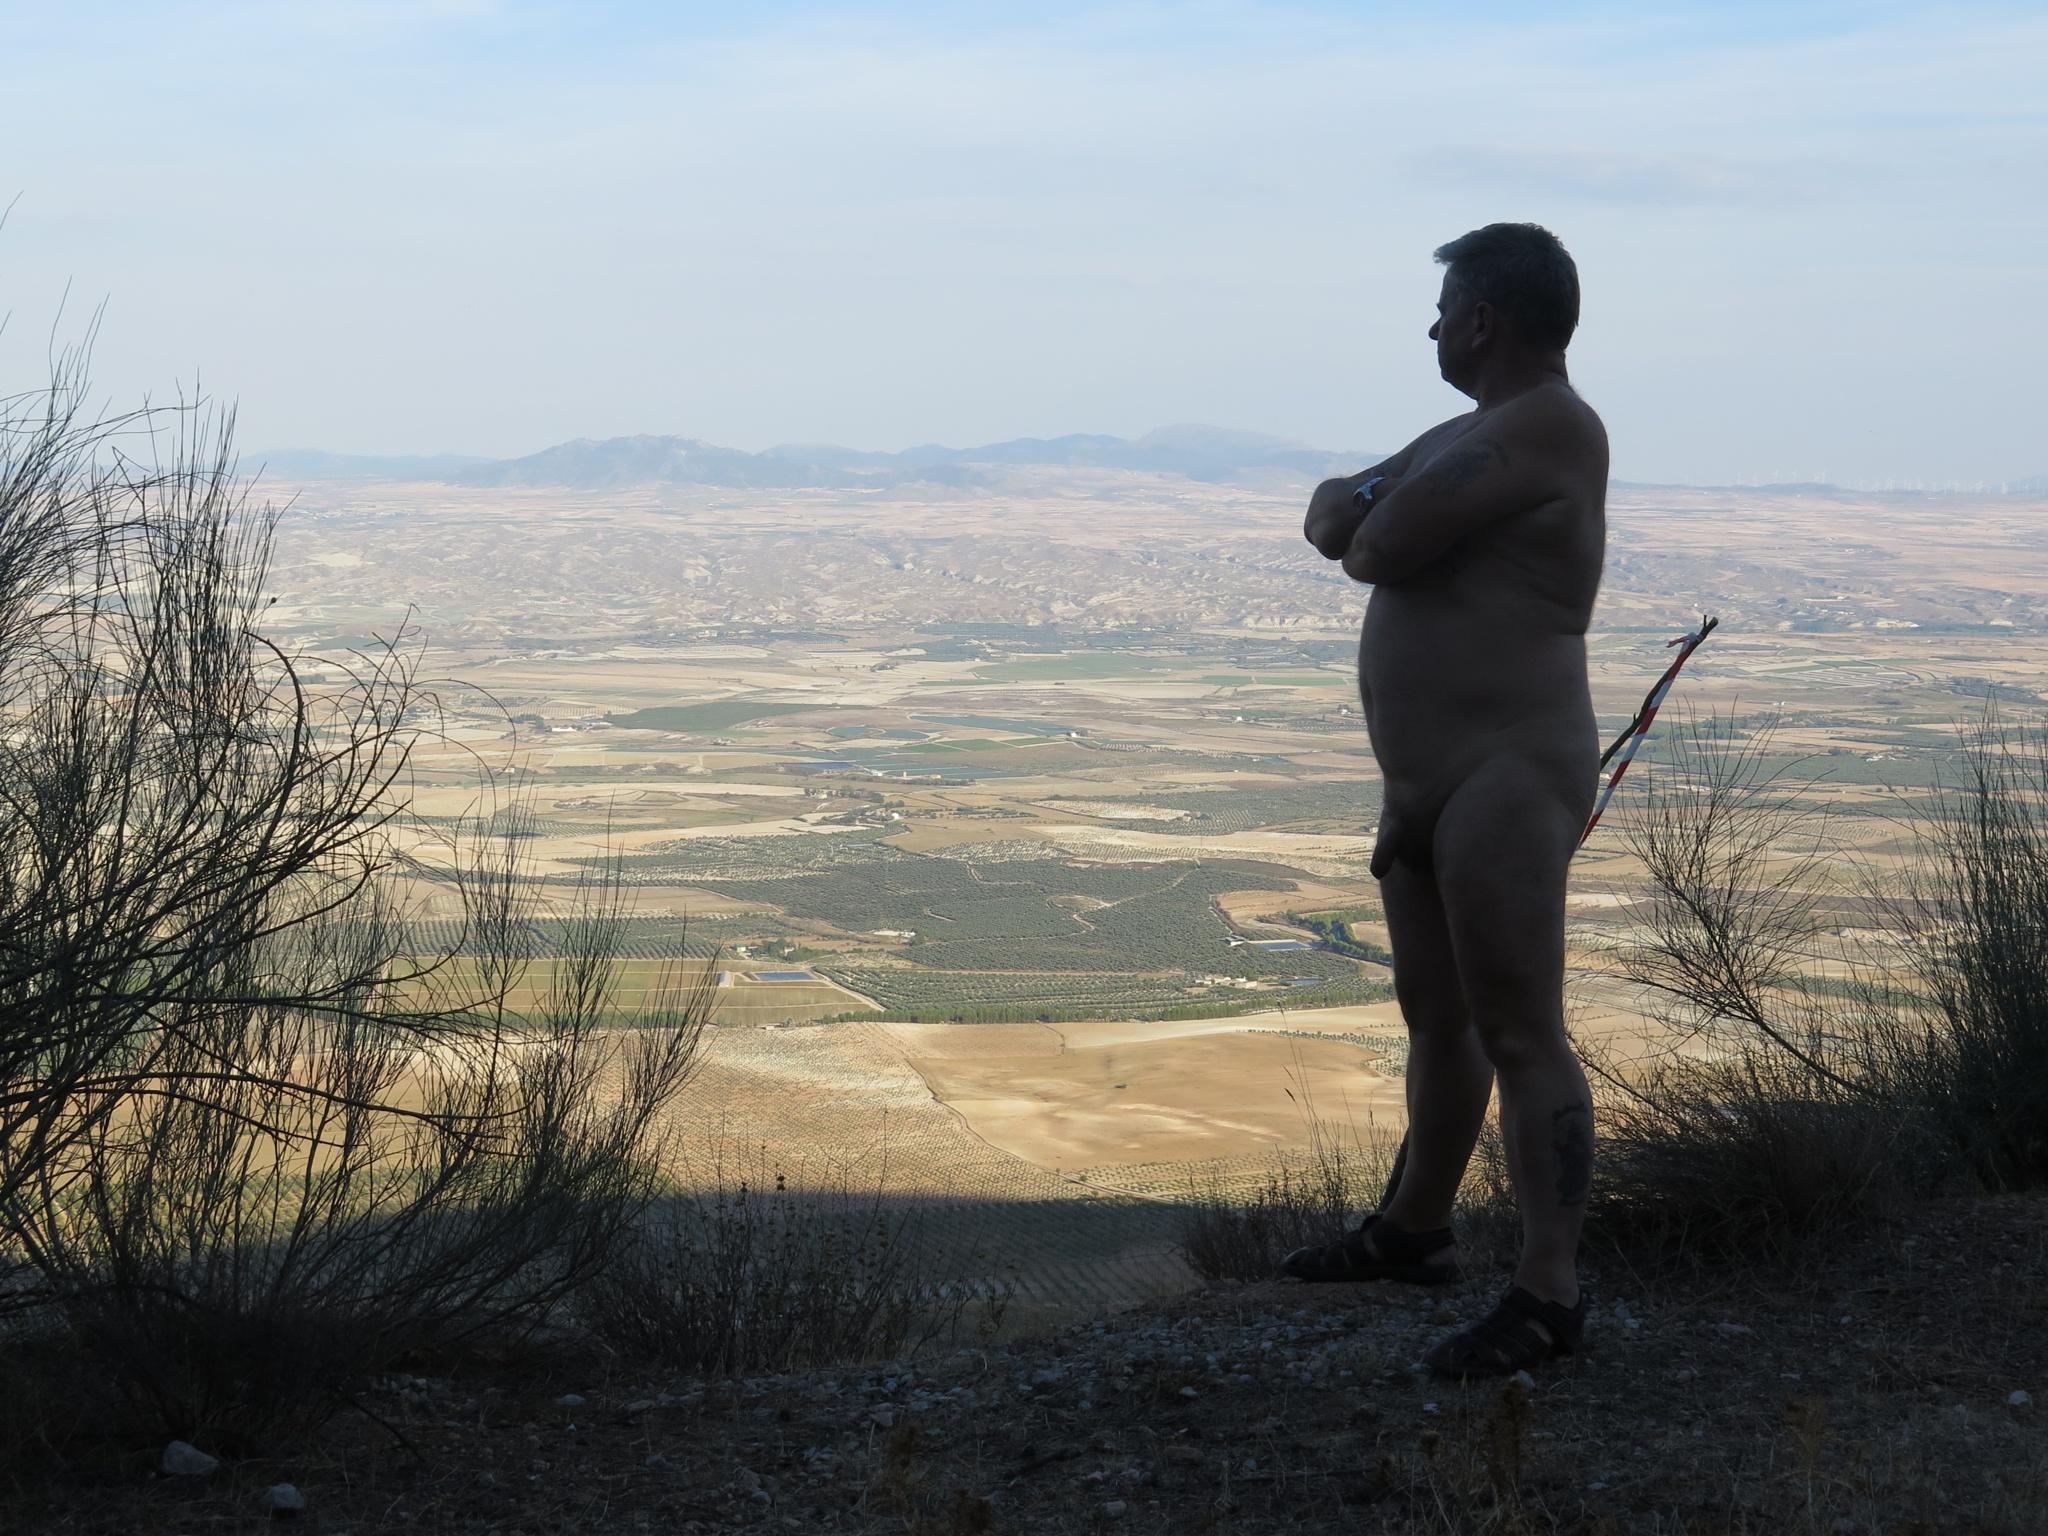 Mountain man by SteveR